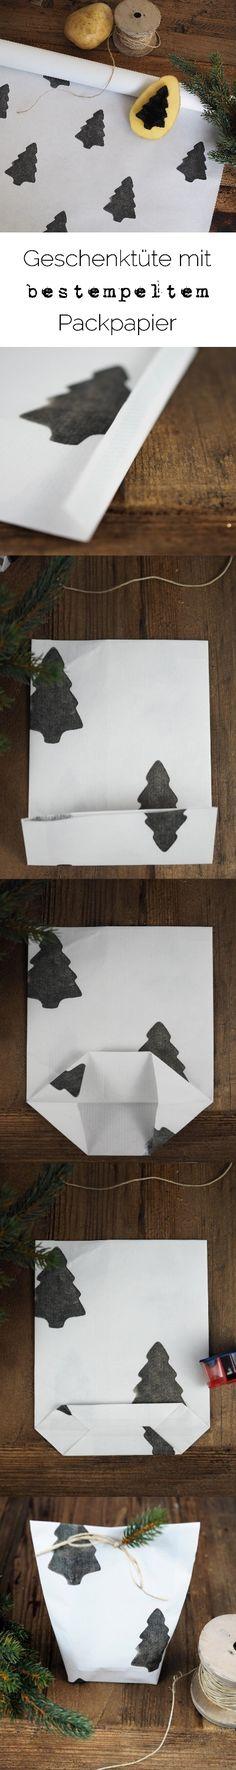 Geschenktüte mit bestempeltem Packpapier/Geschenkpapier